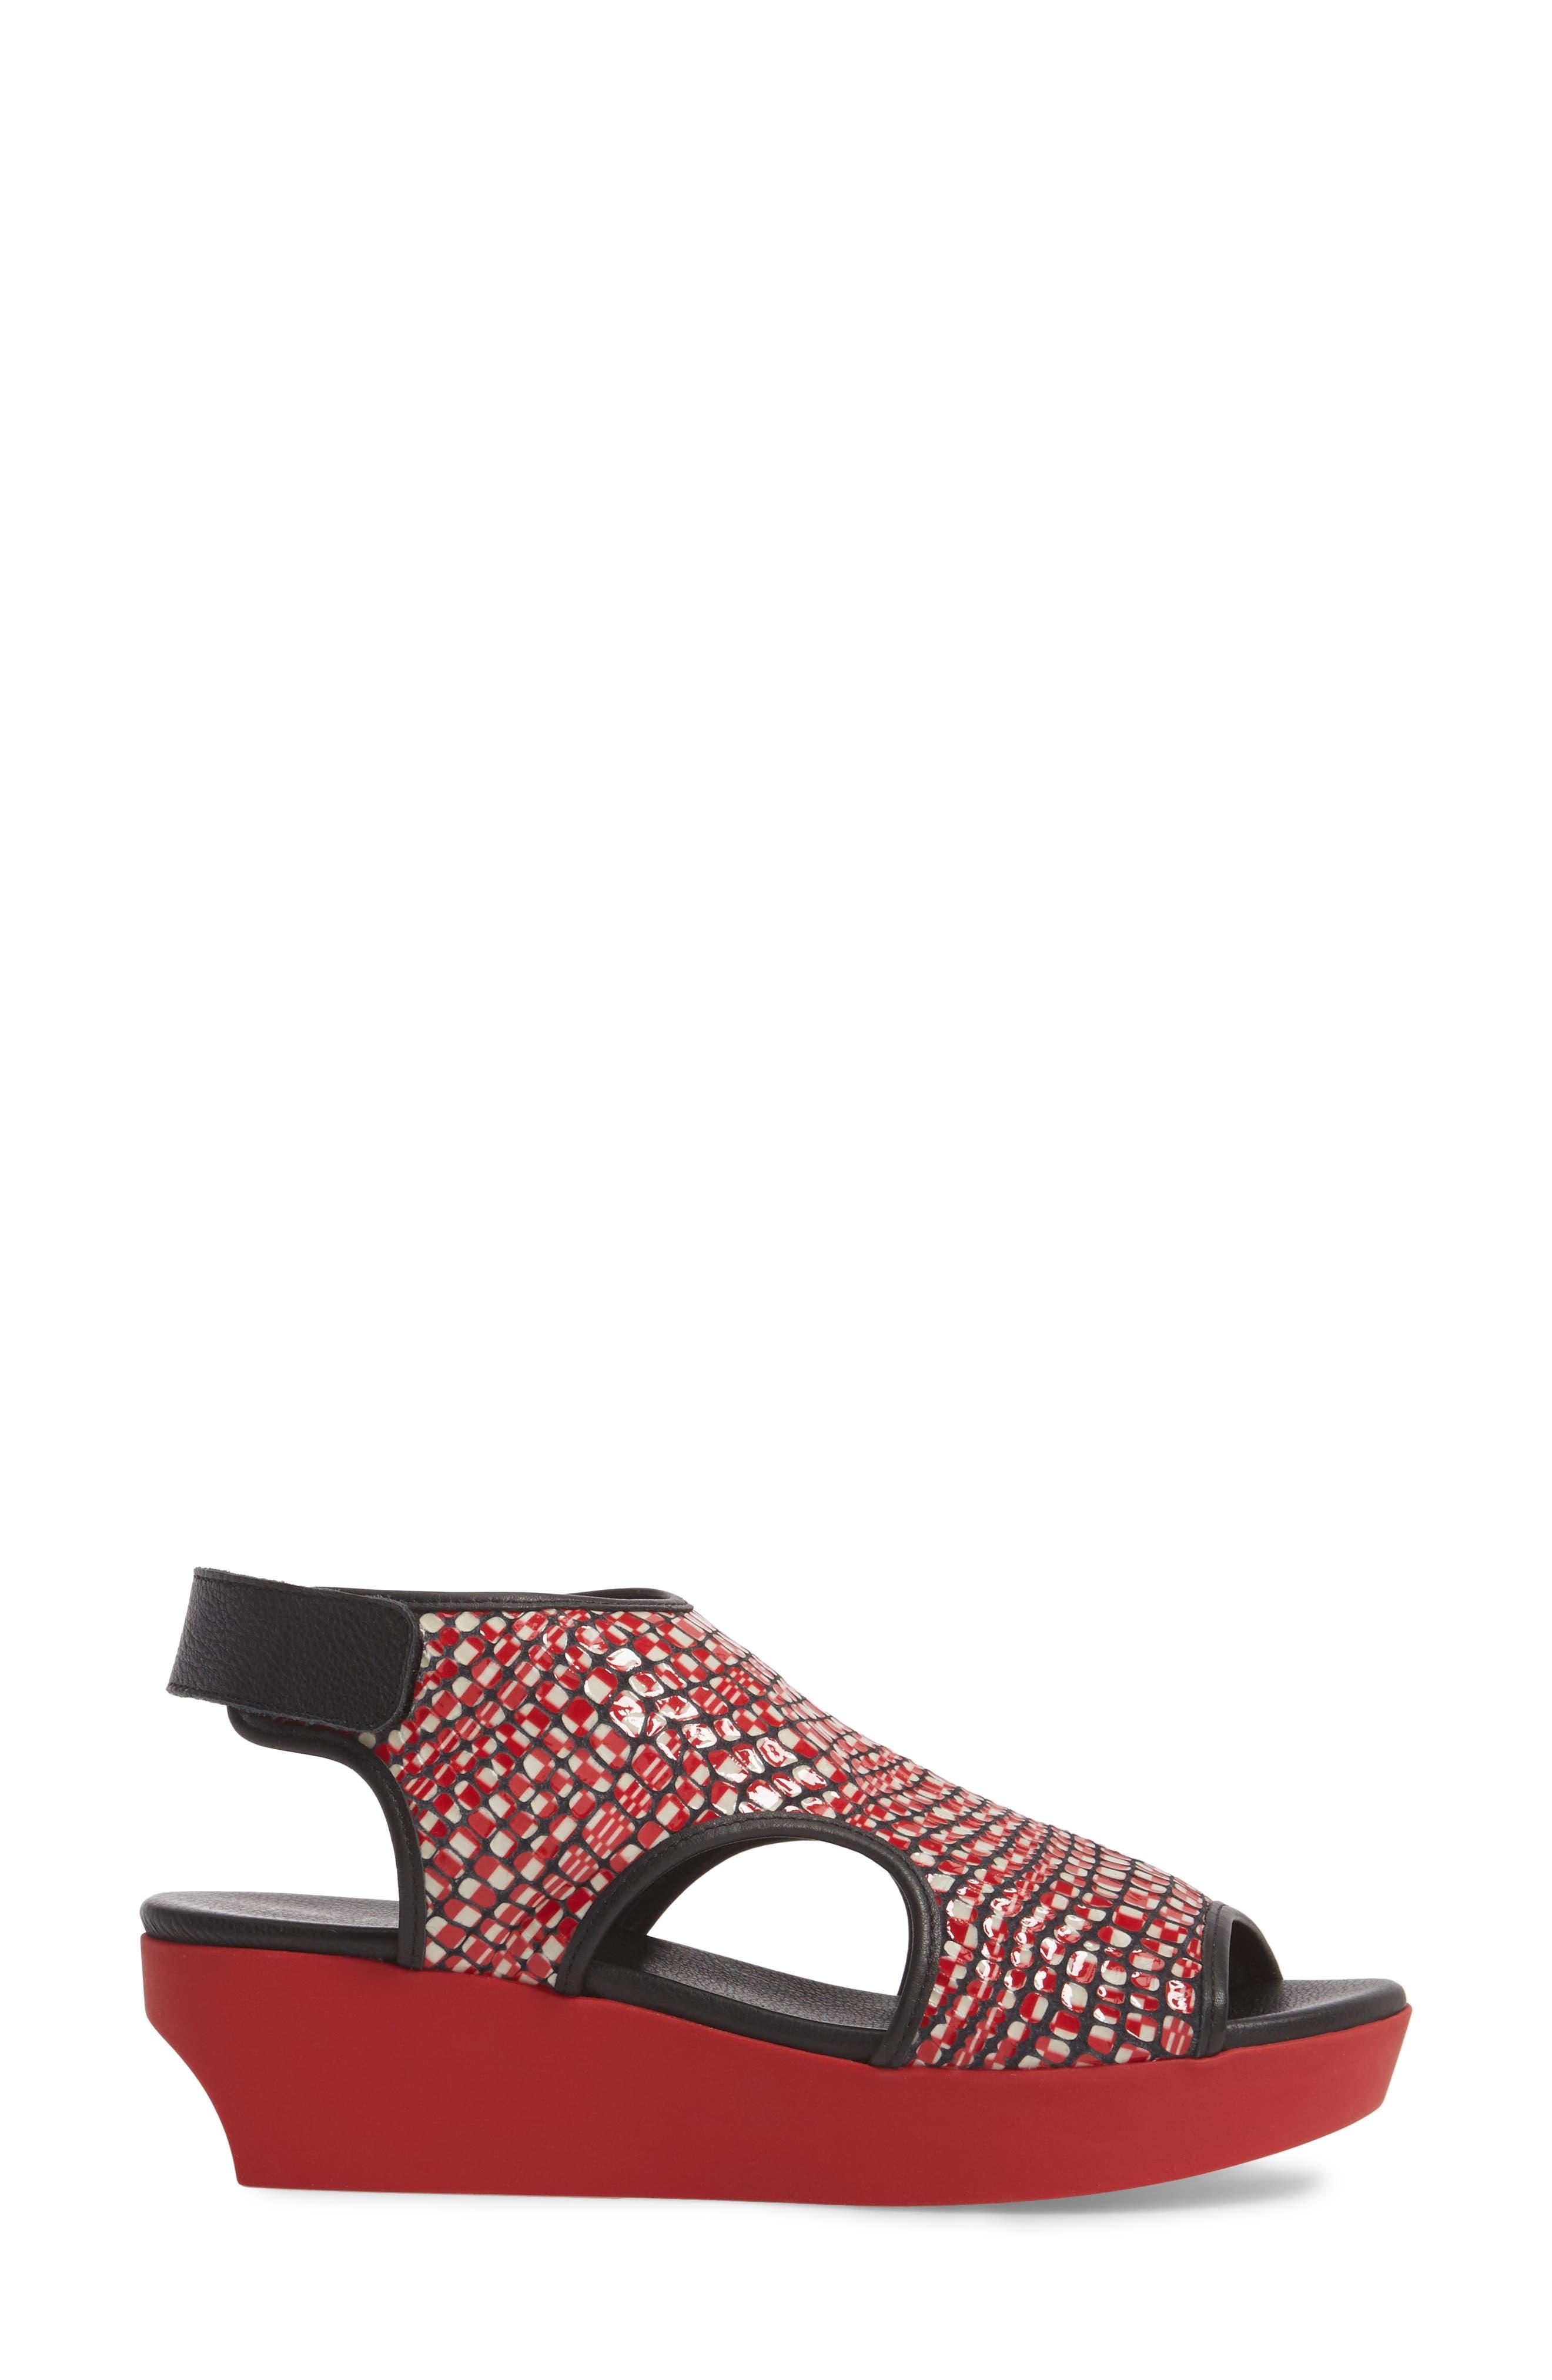 Naka Popa Wedge Sandal,                             Alternate thumbnail 3, color,                             Noir/ Rosso Leather